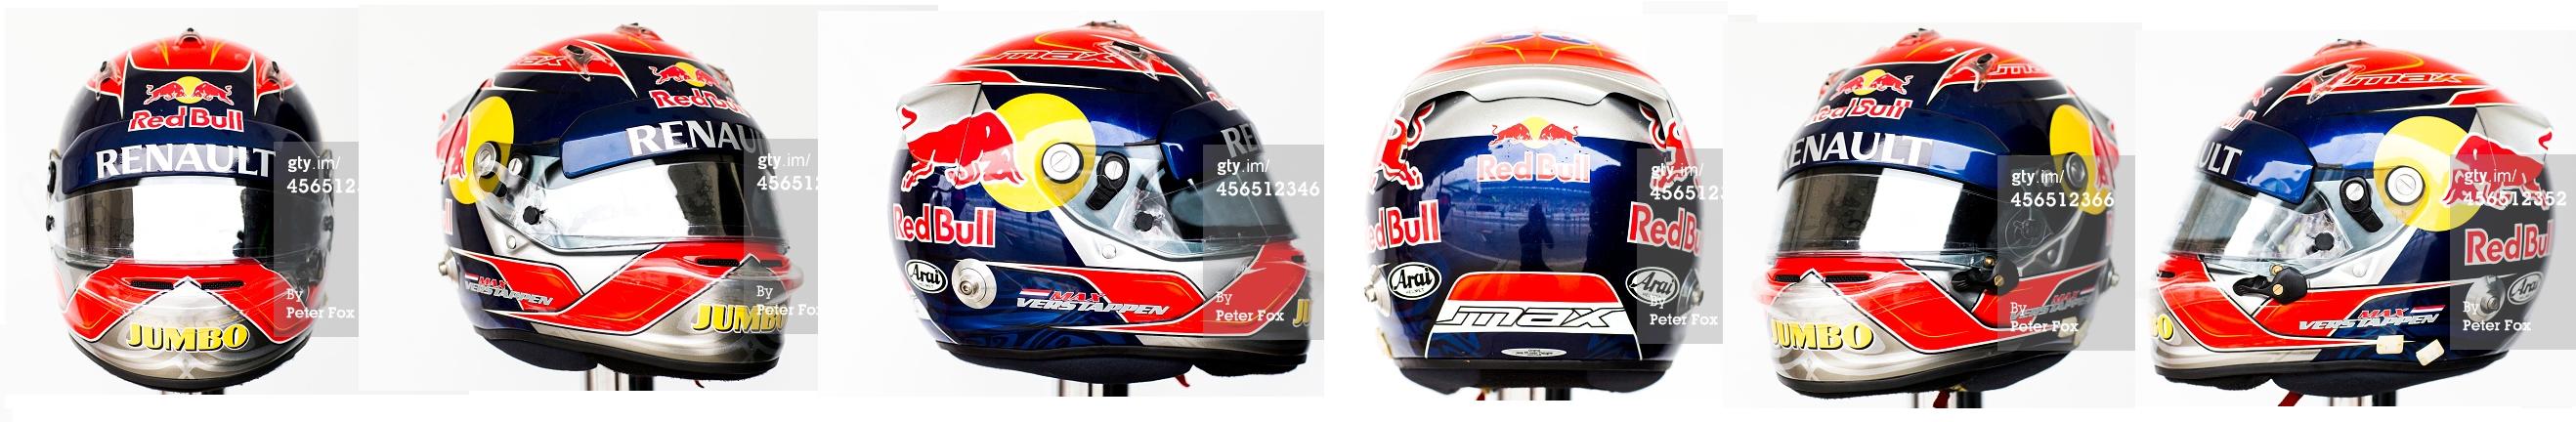 Verstappen 2014 Suzuka Toro Rosso F1 Helmet